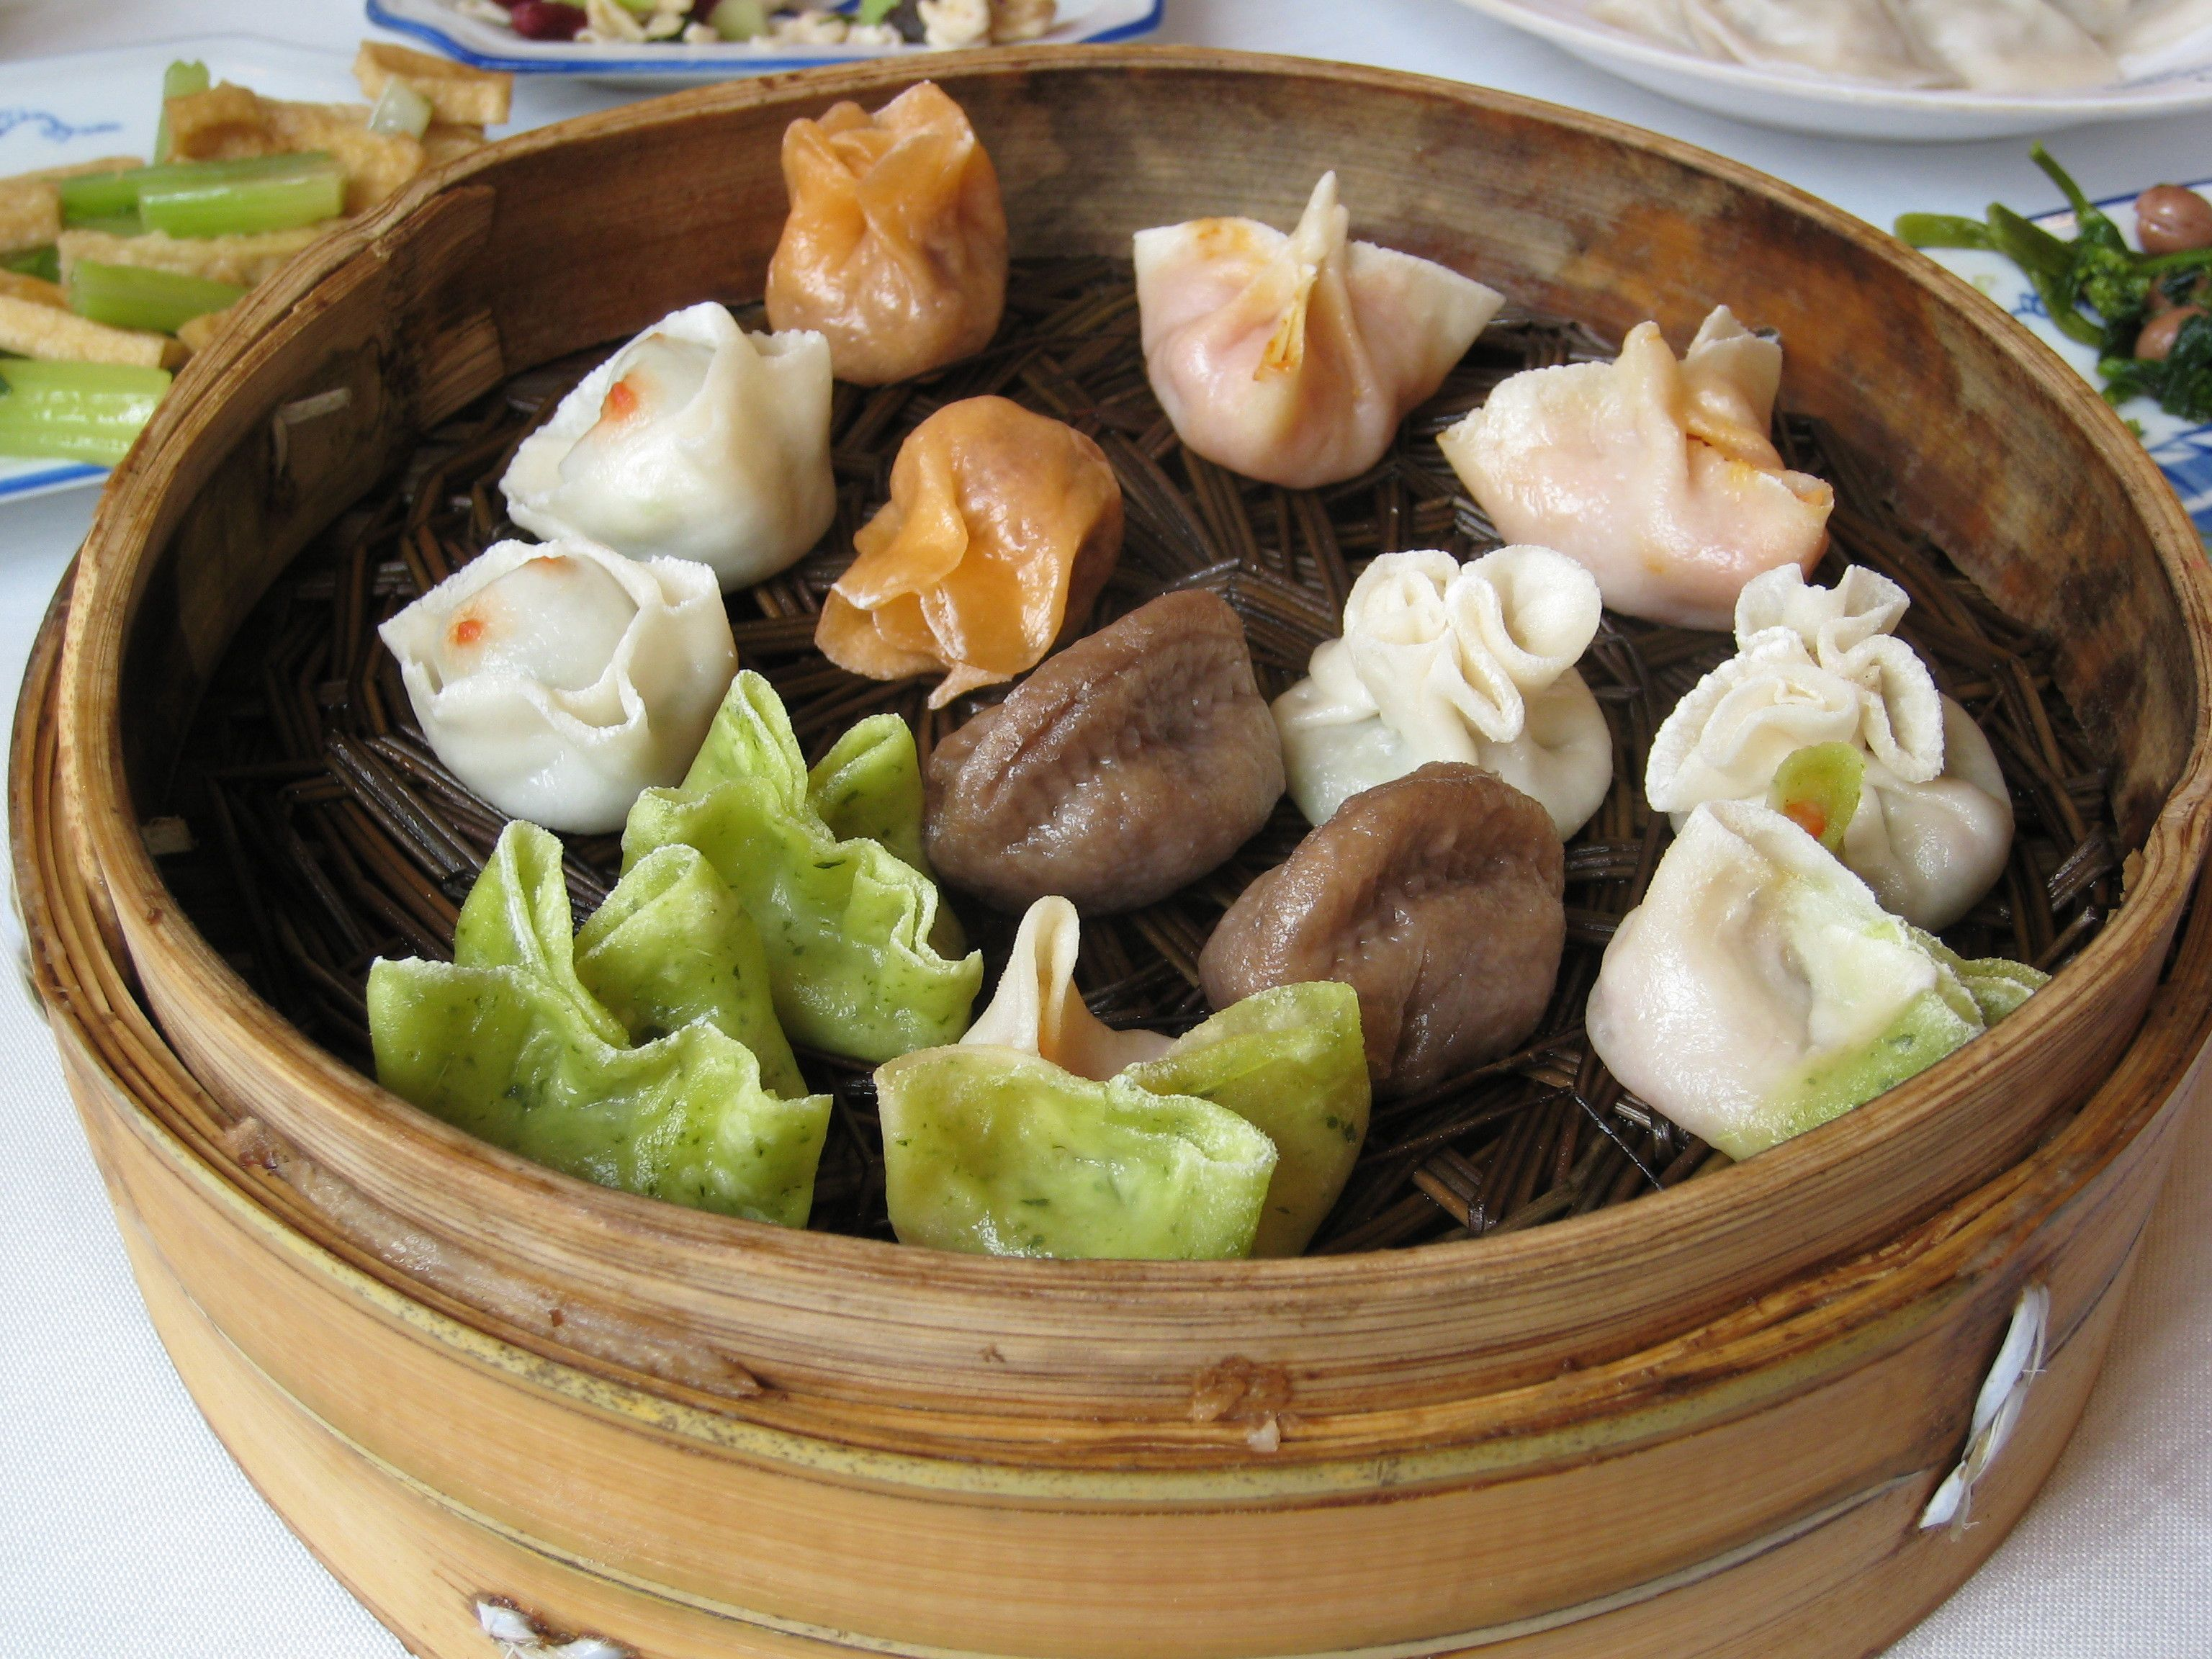 Dumblingit maistuvat Kiinassa.  #Dumbling #China #Kiina